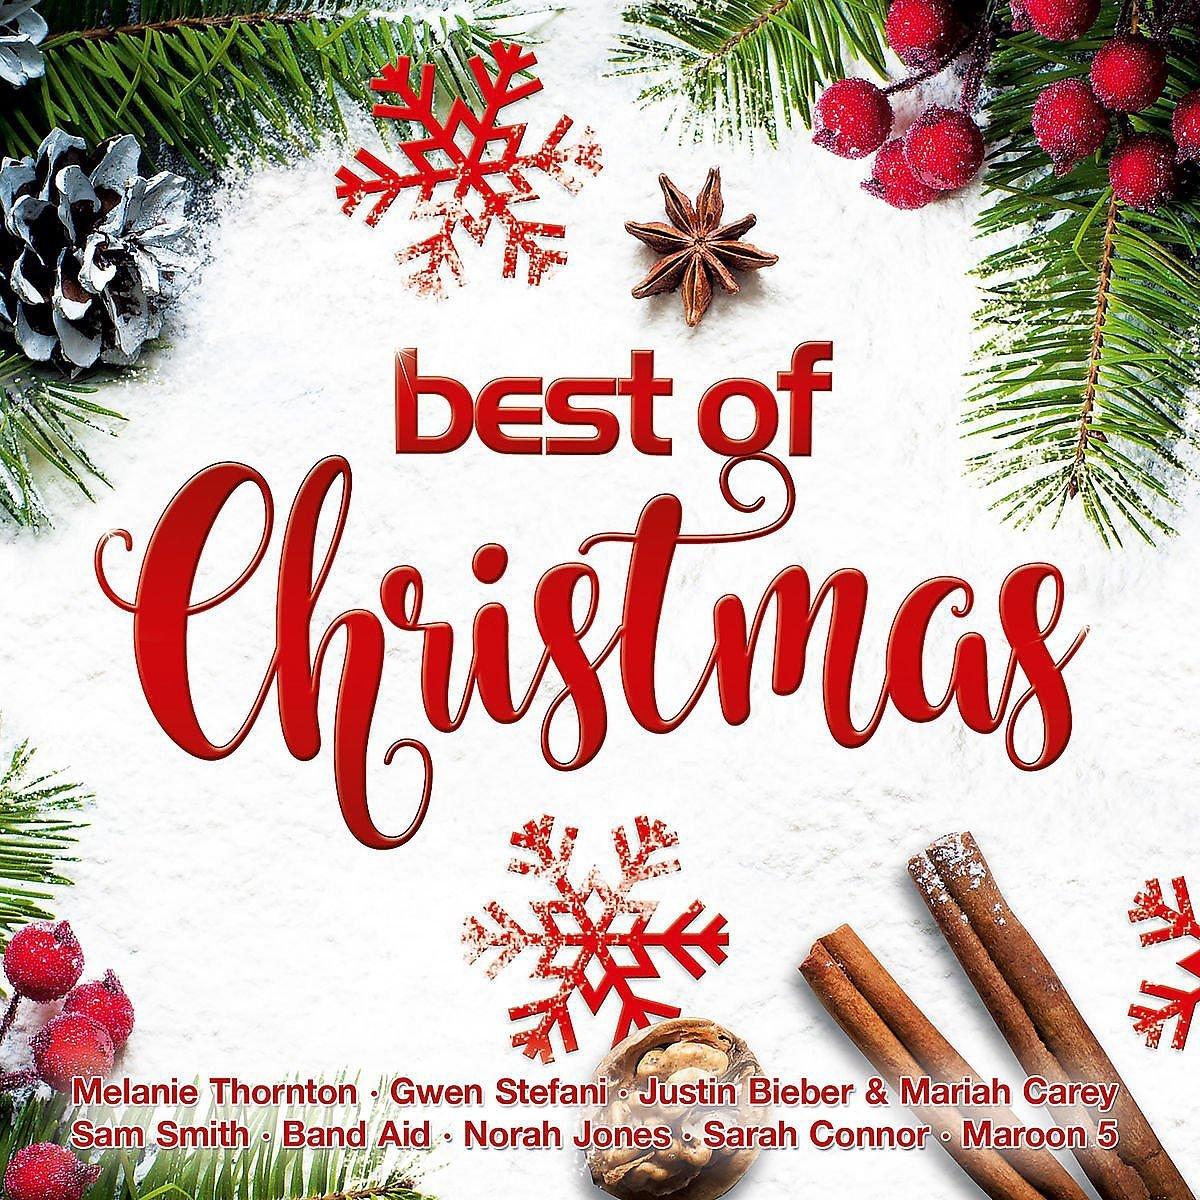 Best of Christmas - Various: Amazon.de: Musik